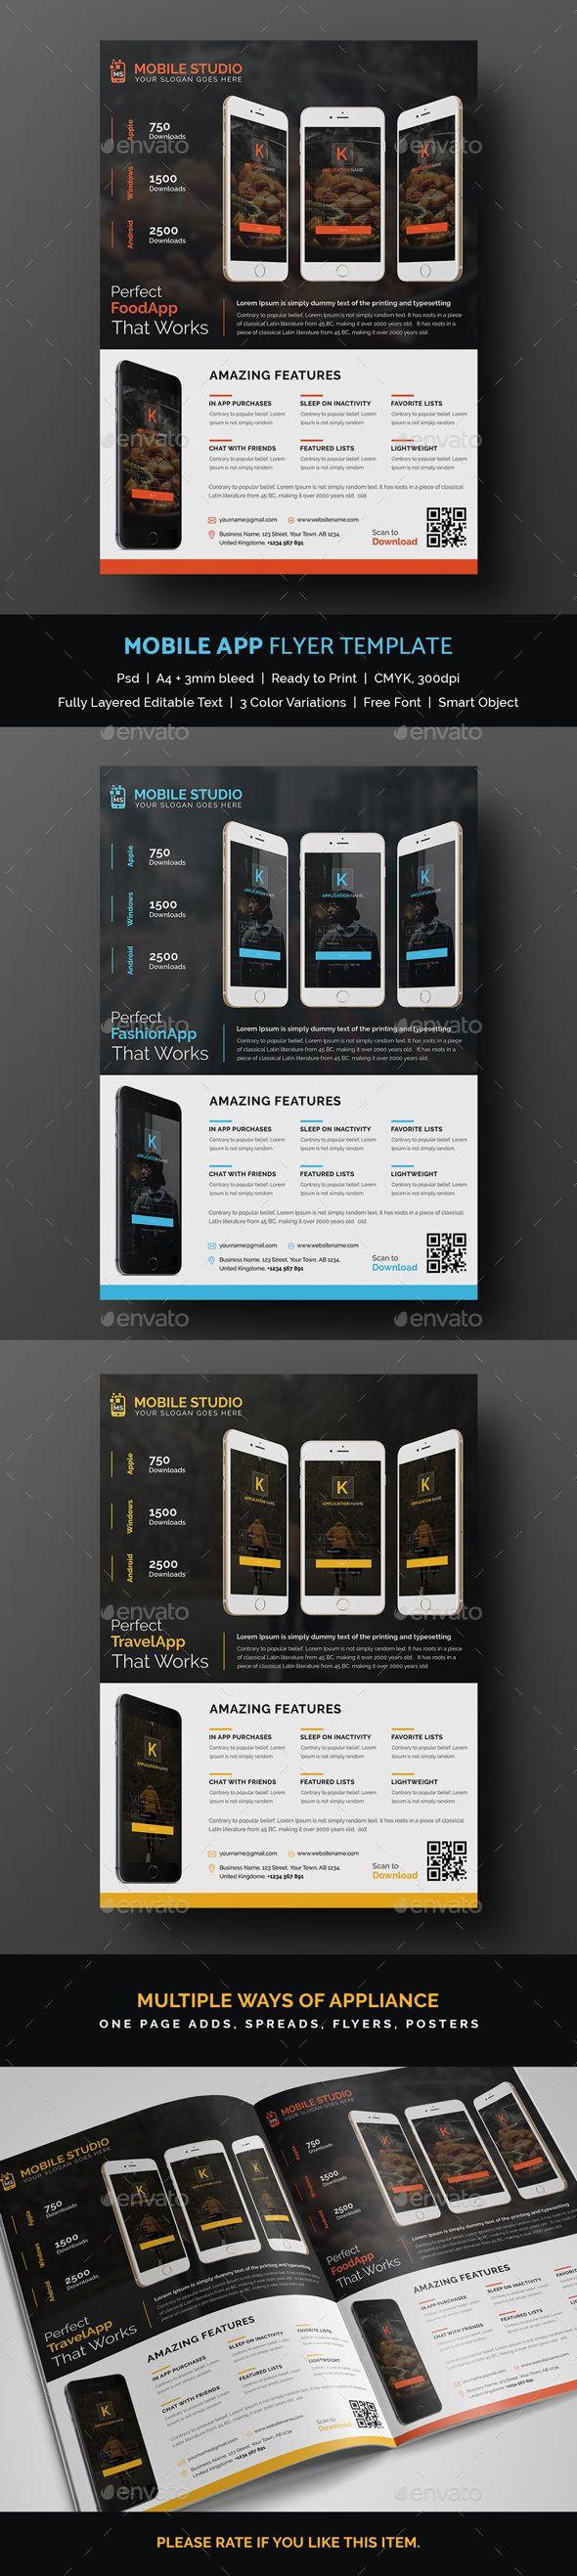 #Mobile #App #Flyer Template - Commerce Flyers Download here: https://graphicriver.net/item/mobile-app-flyer-template/19516684?ref=alena994